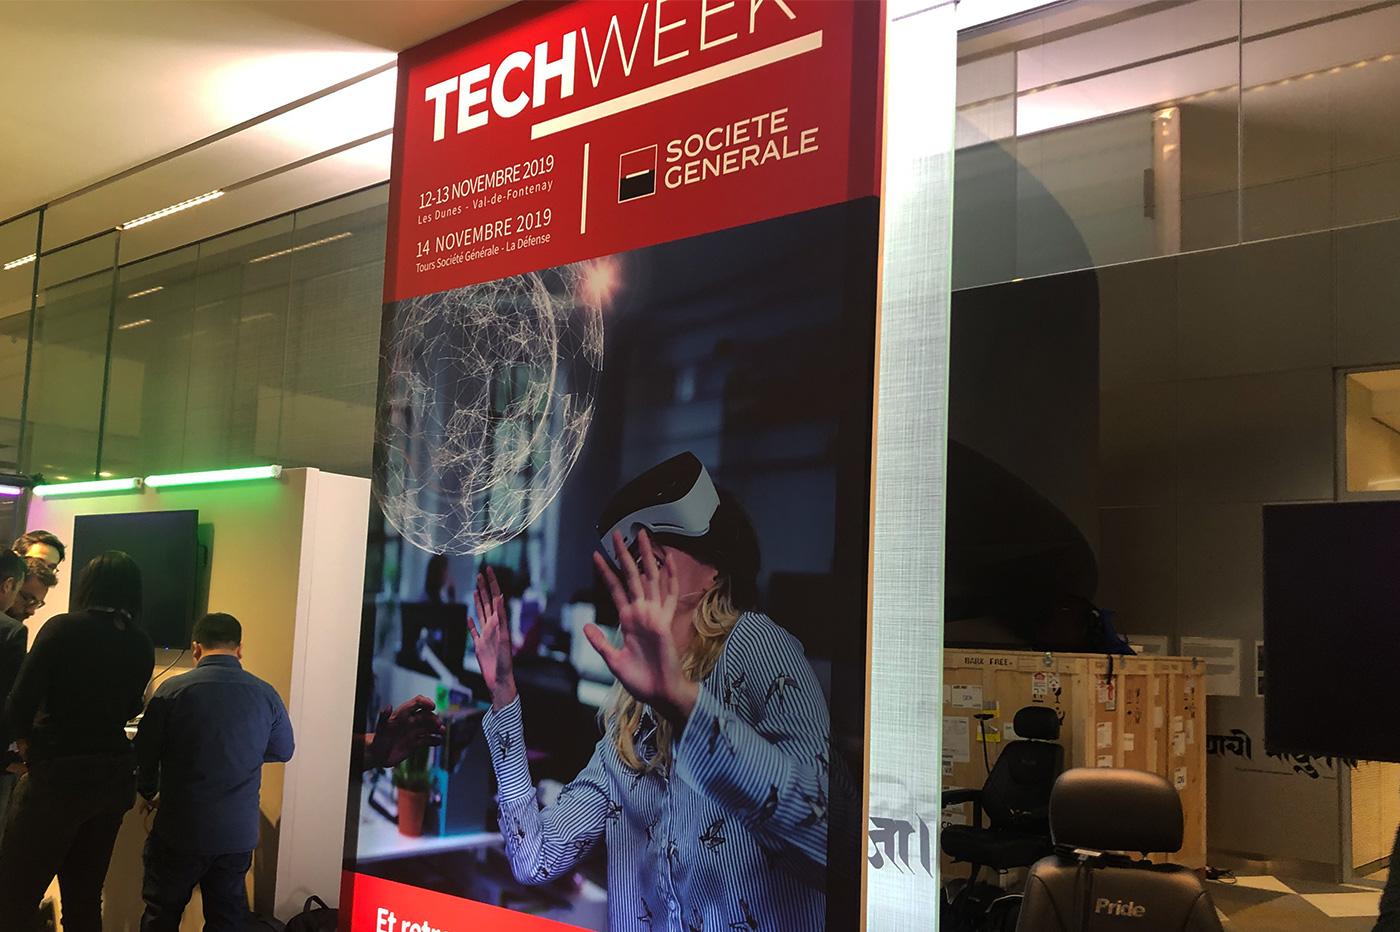 TechWeekSG Société Générale